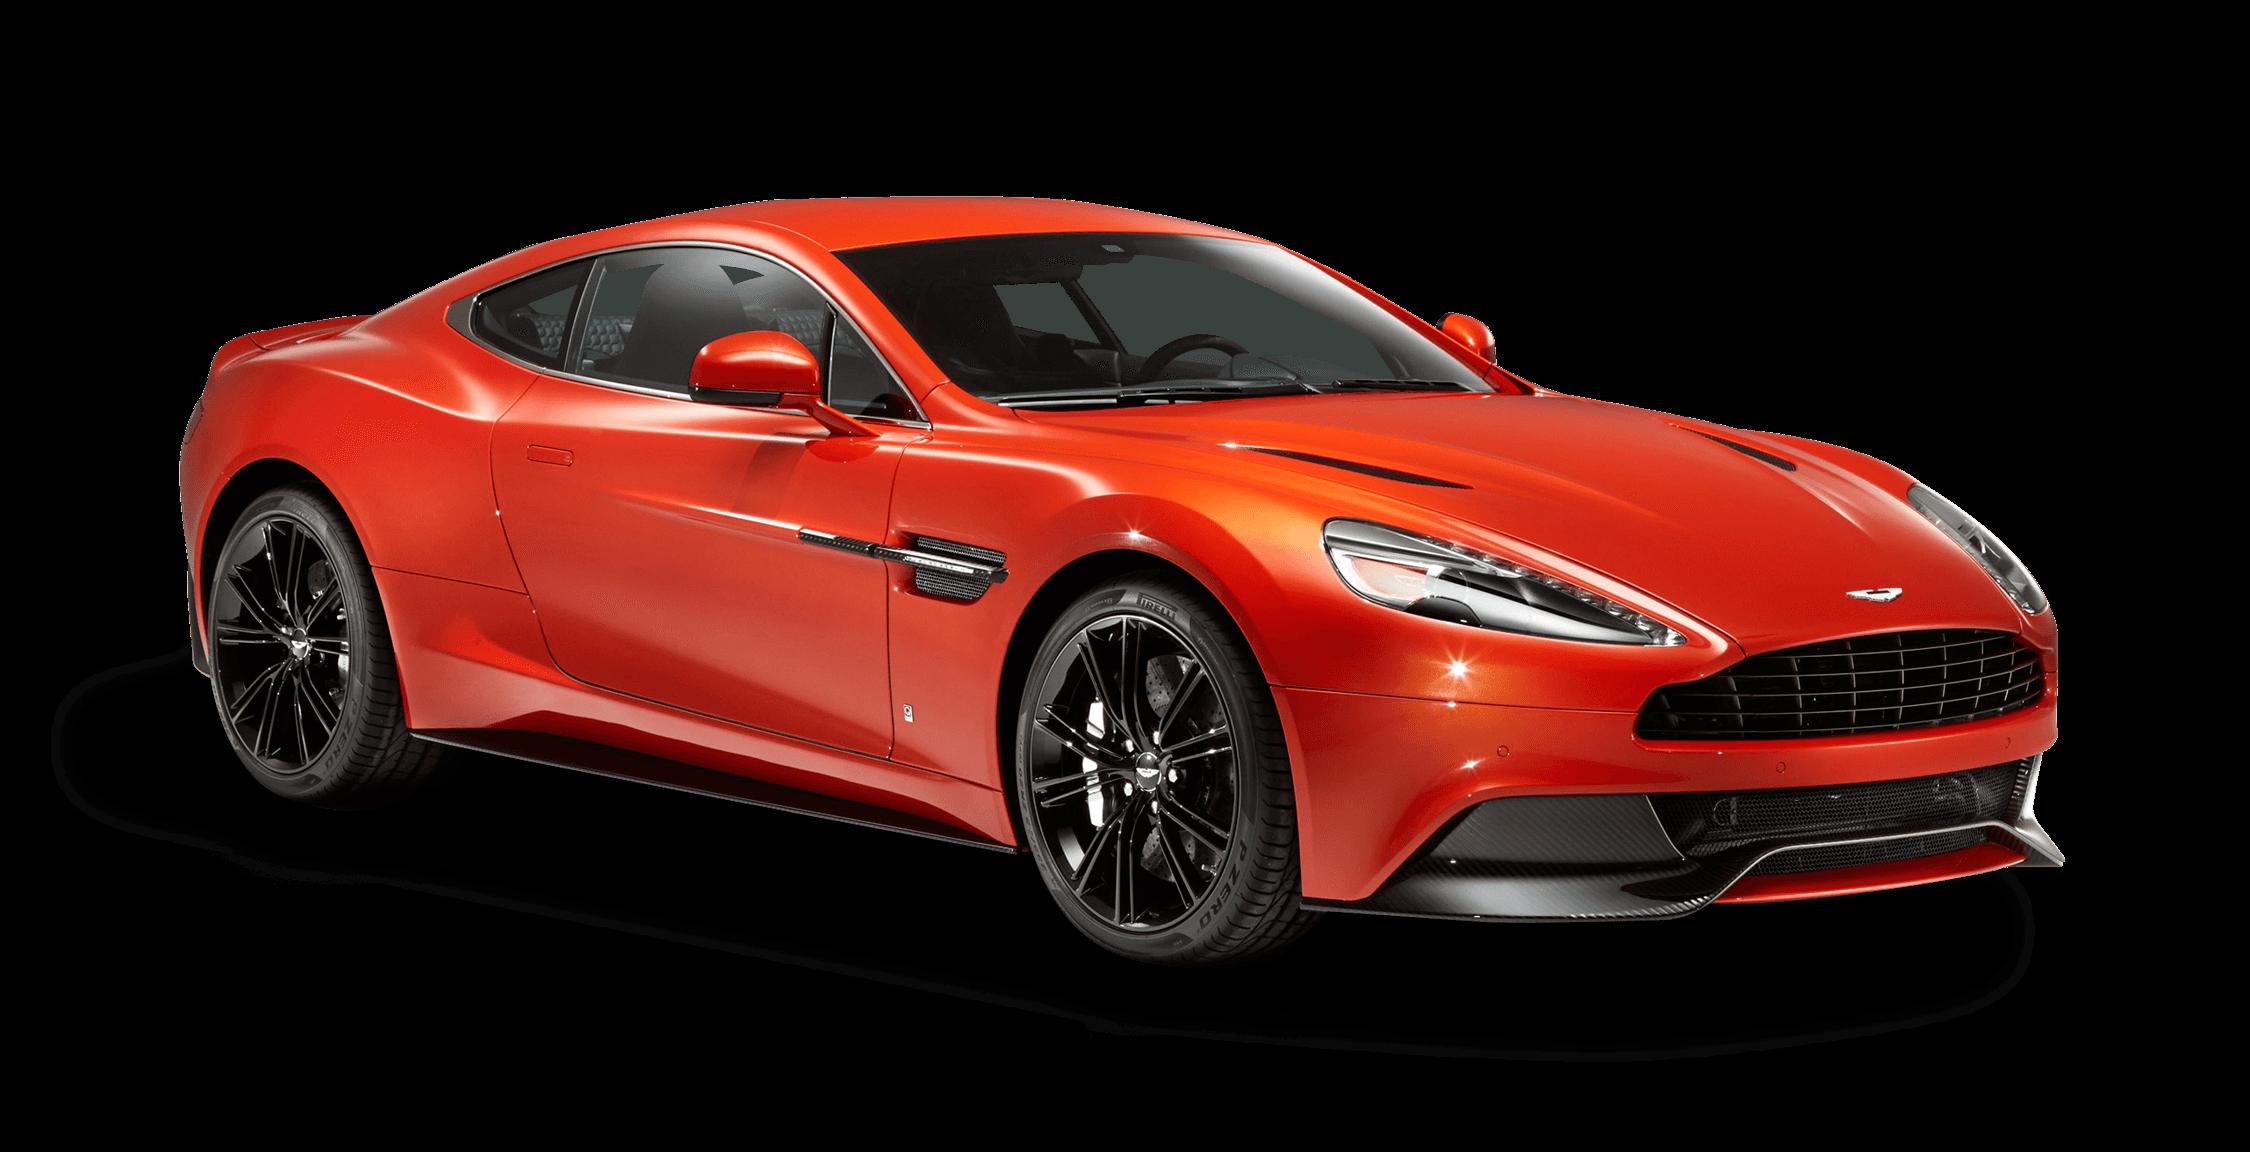 Red Aston Martin transparent PNG.